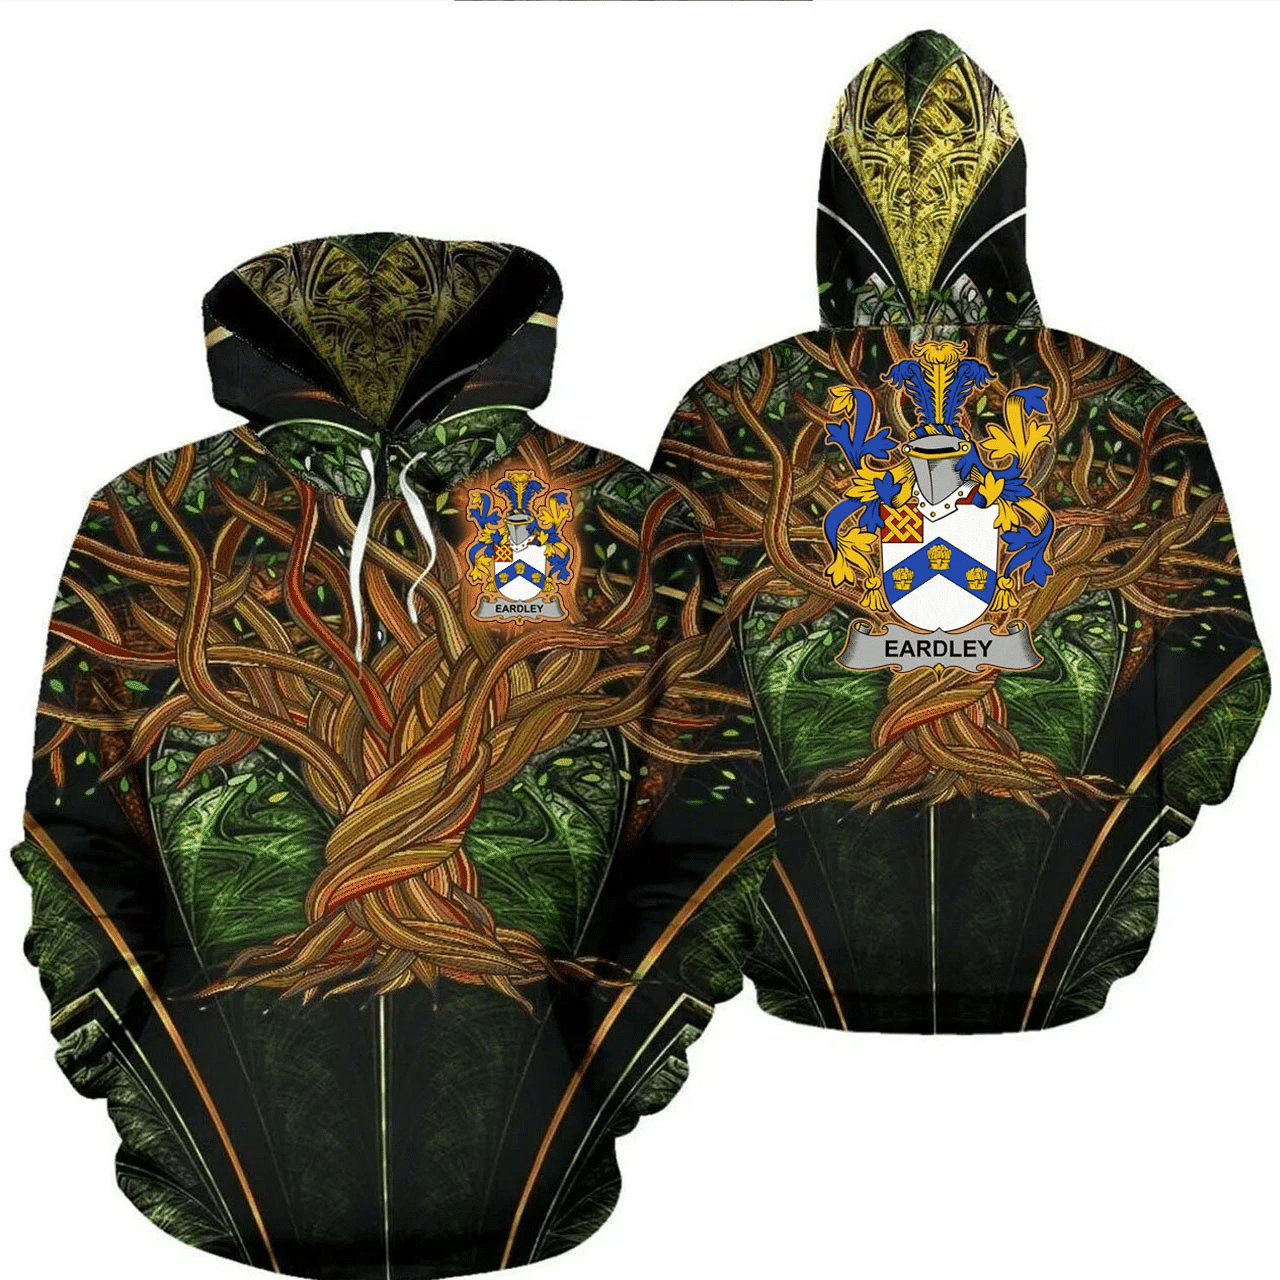 1stIreland Ireland Hoodie - Eardley Irish Family Crest Hoodie - Tree Of Life A7